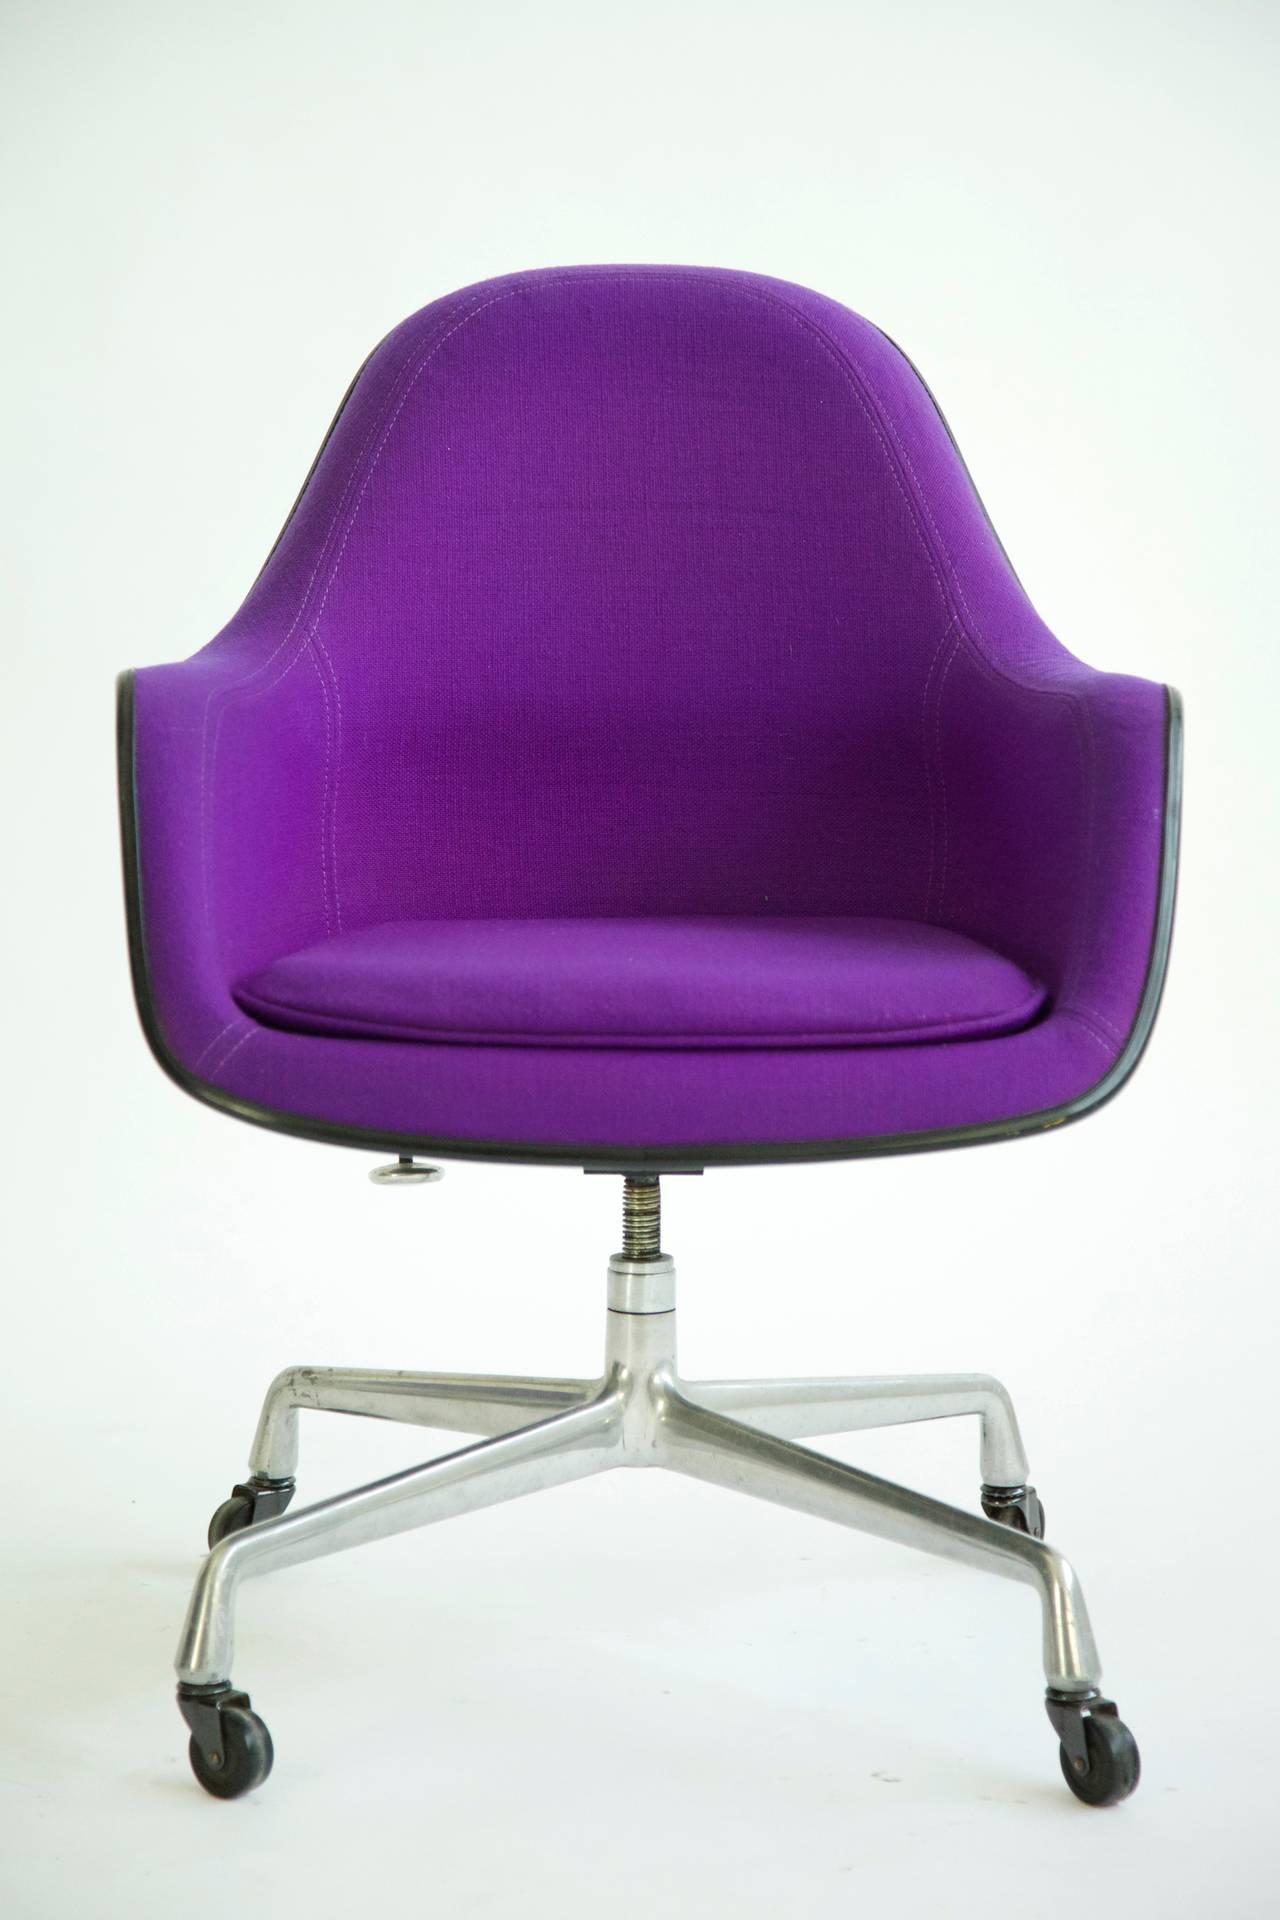 Charles Eames Loose Cushion Armchair At 1stdibs